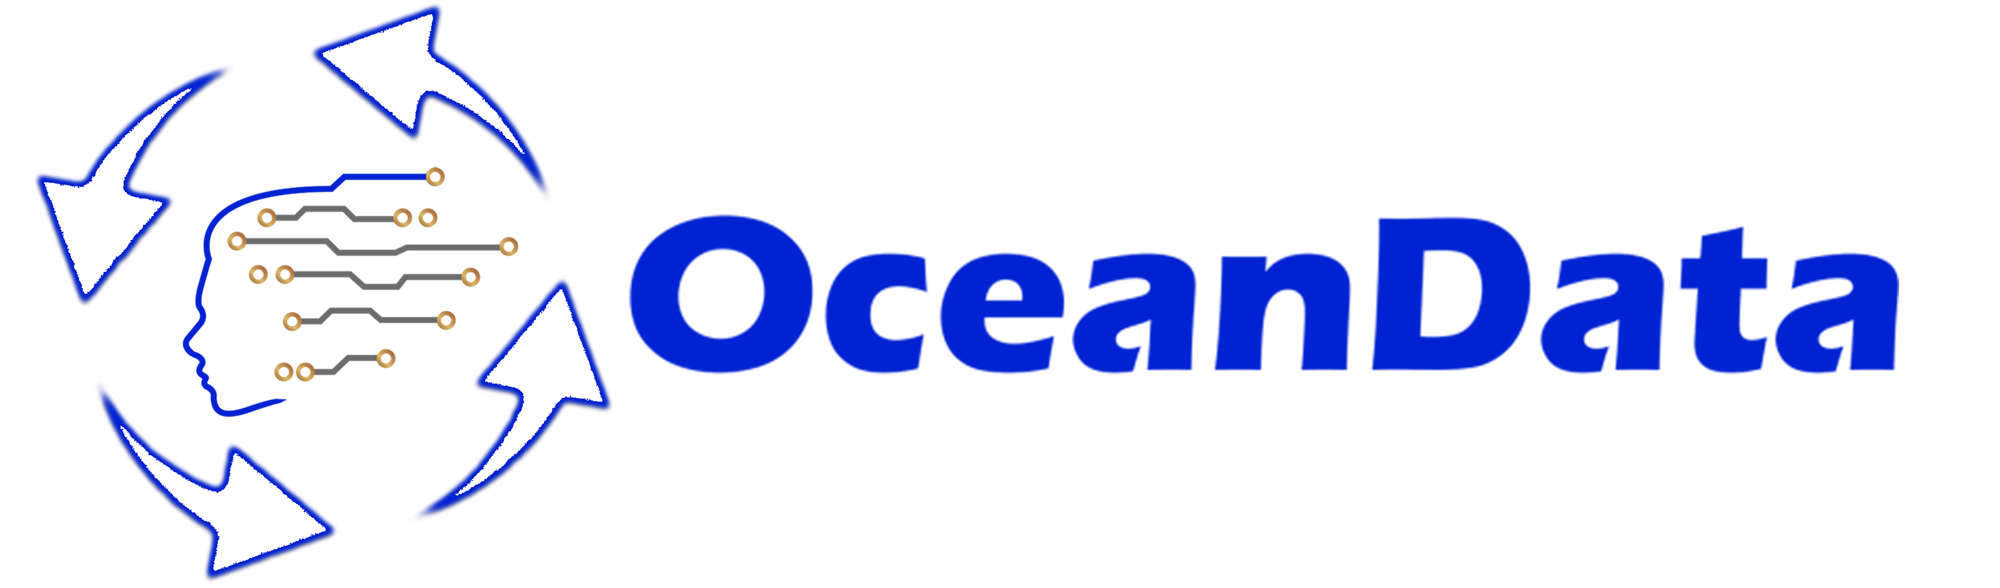 OceanData